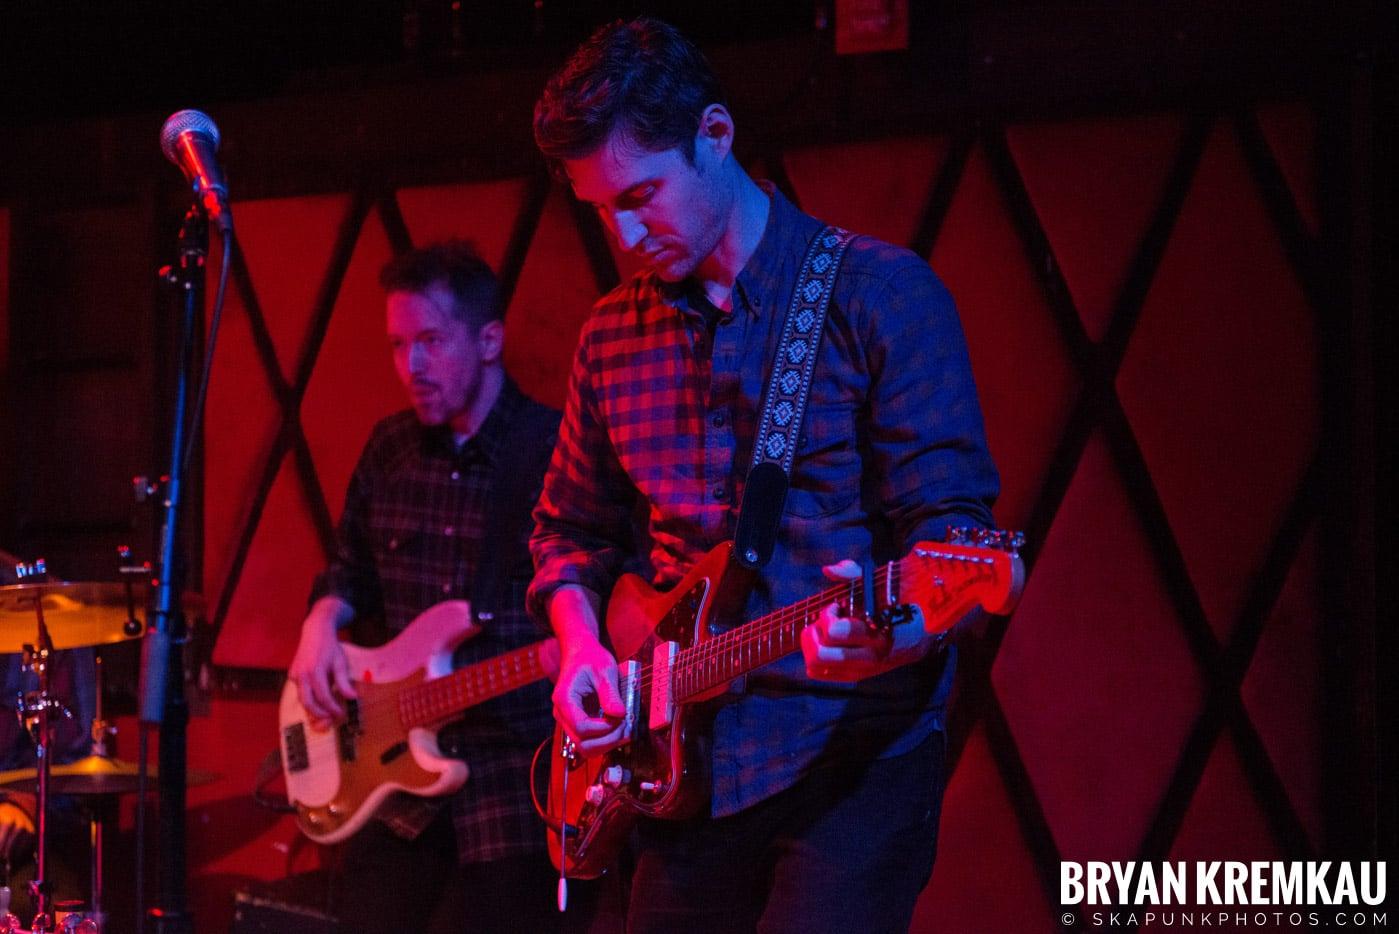 Peter Bradley Adams @ Rockwood Music Hall, NYC - 3.9.13 (32)